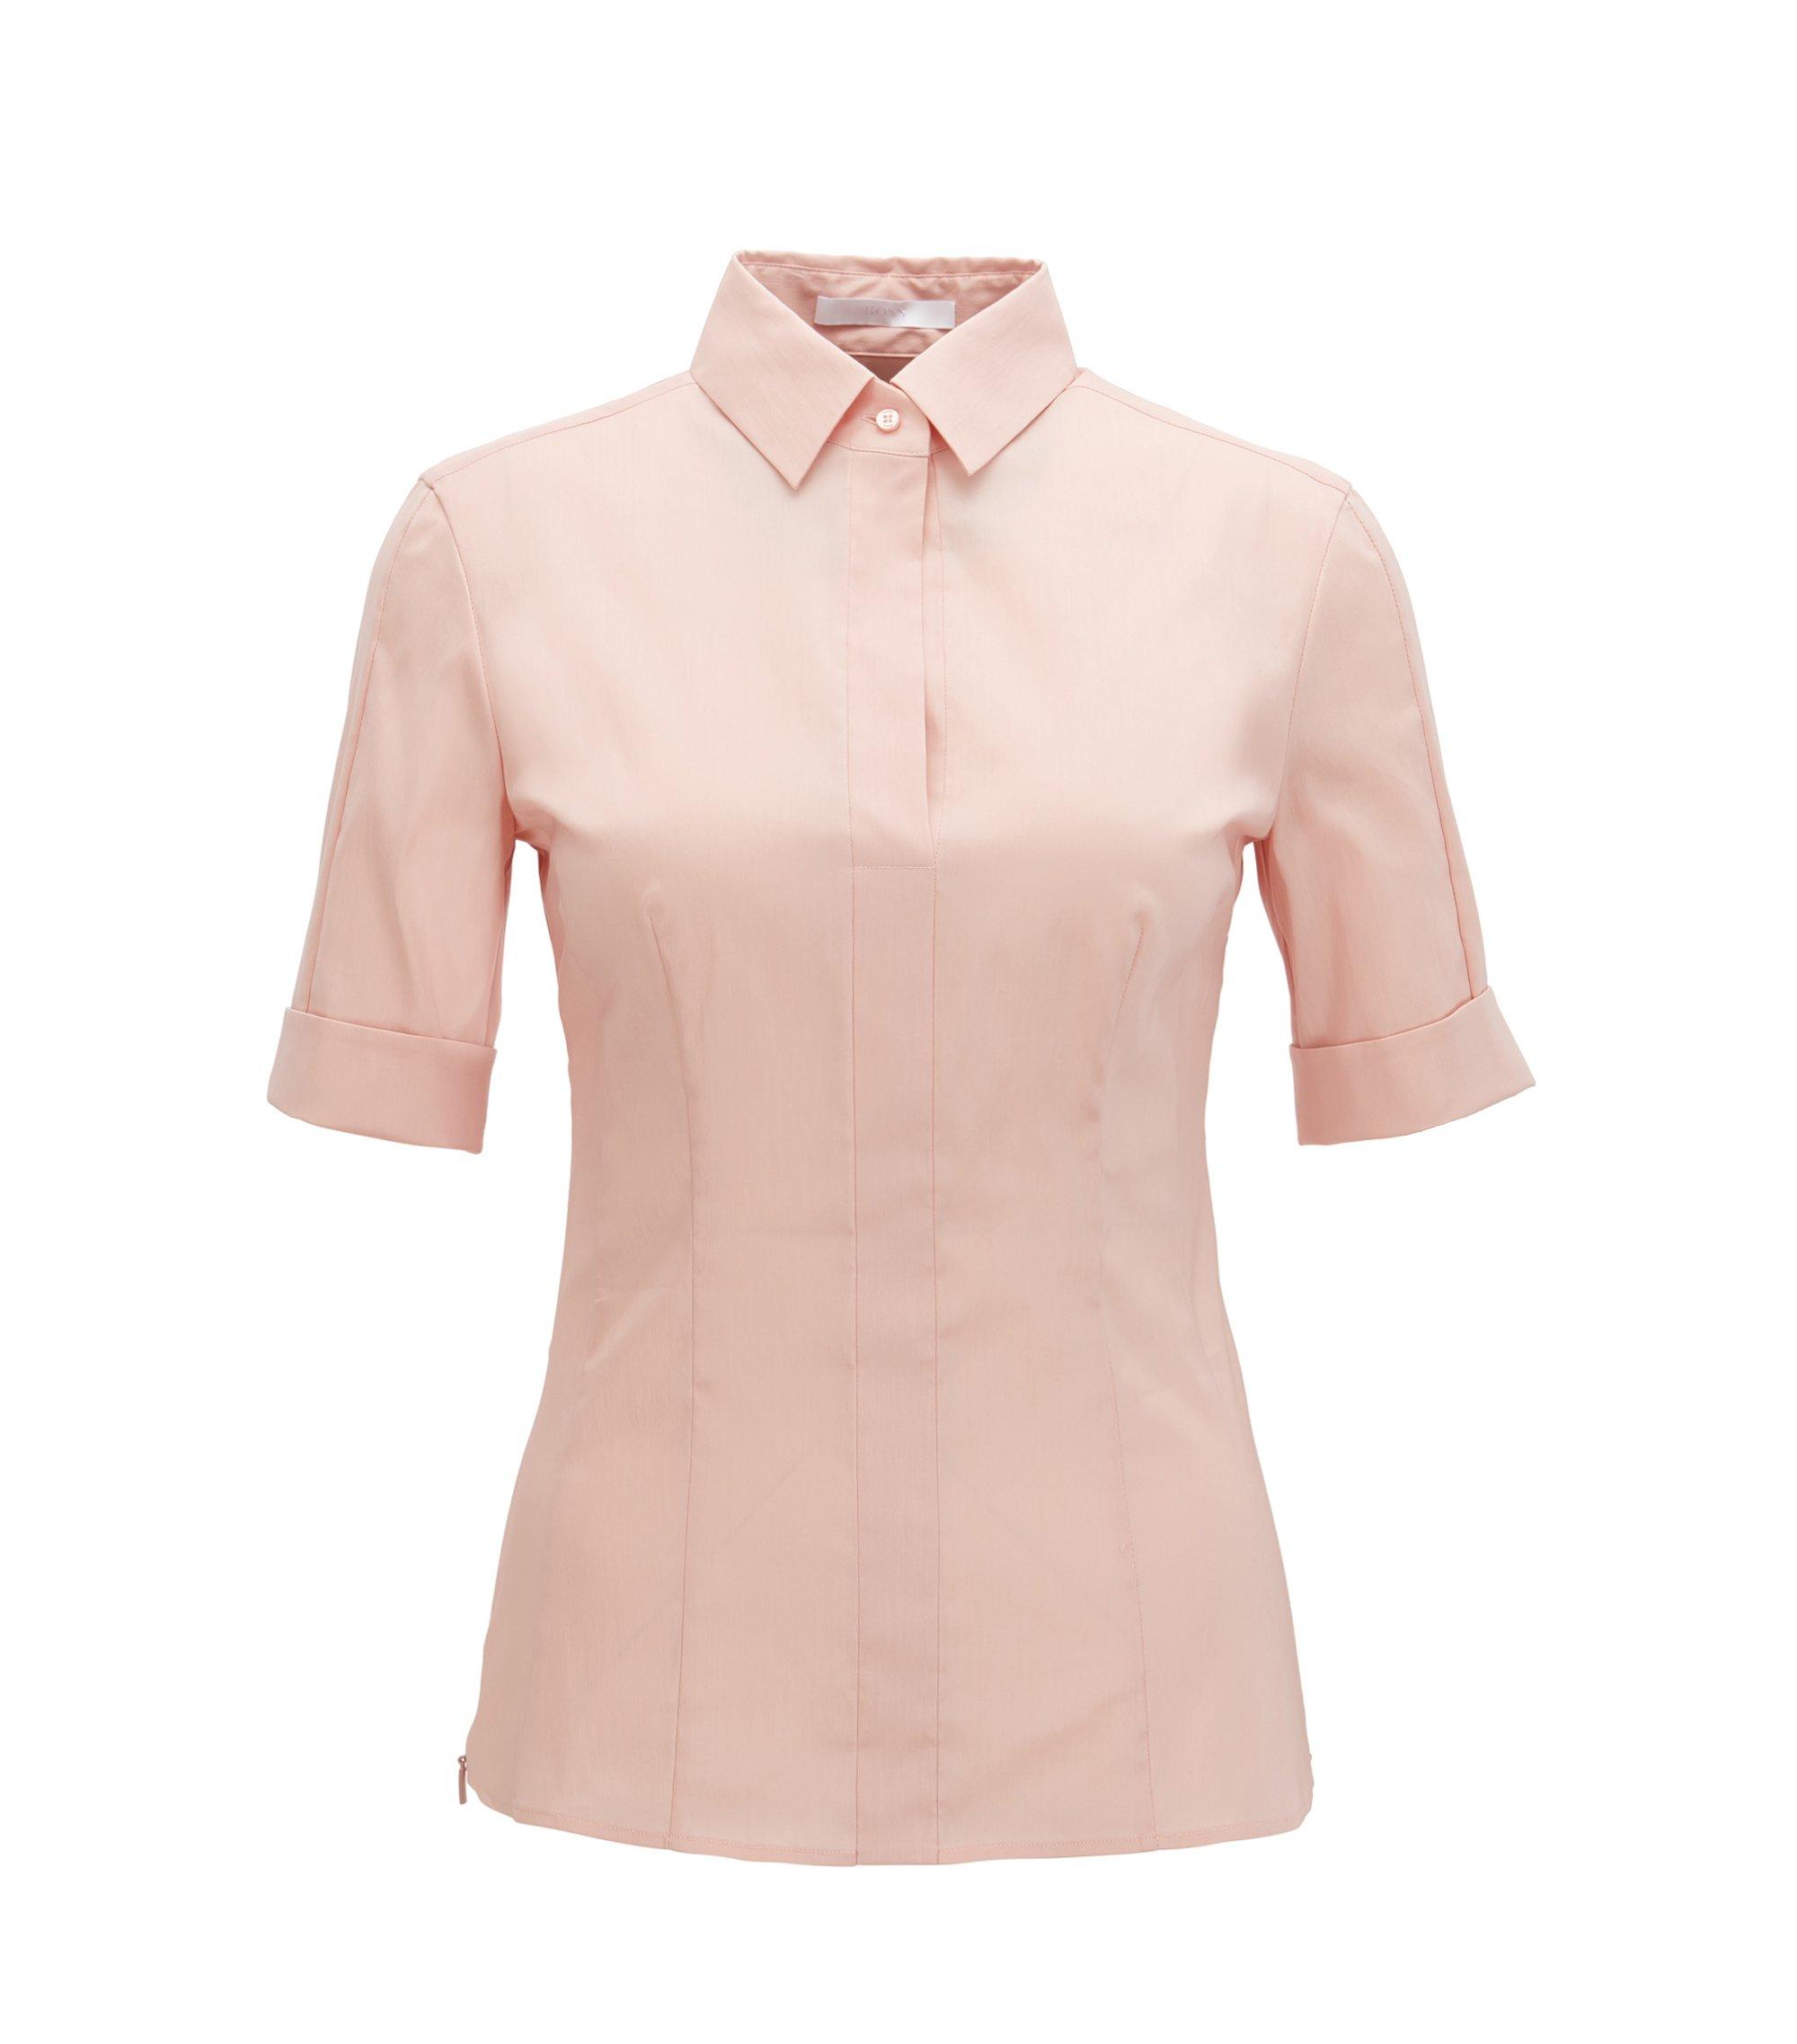 Blusa slim fit en mezcla de algodón con tapeta falsa , Rosa claro